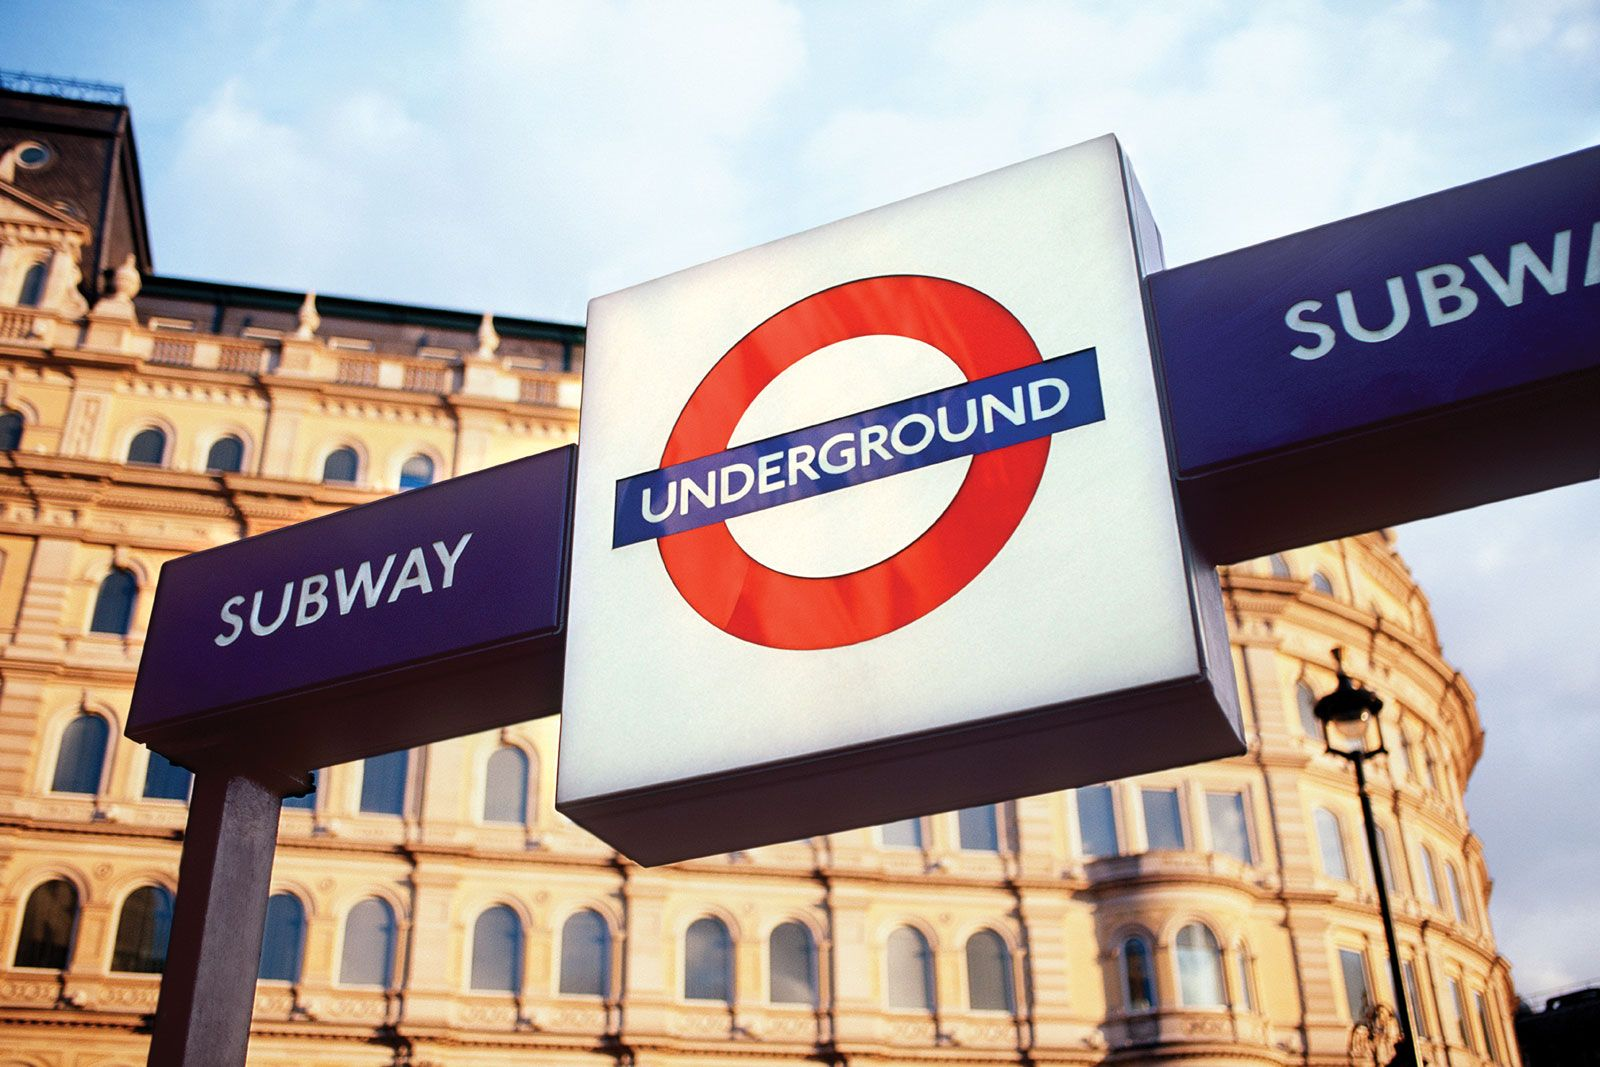 Mind the Gap the London Underground Sign